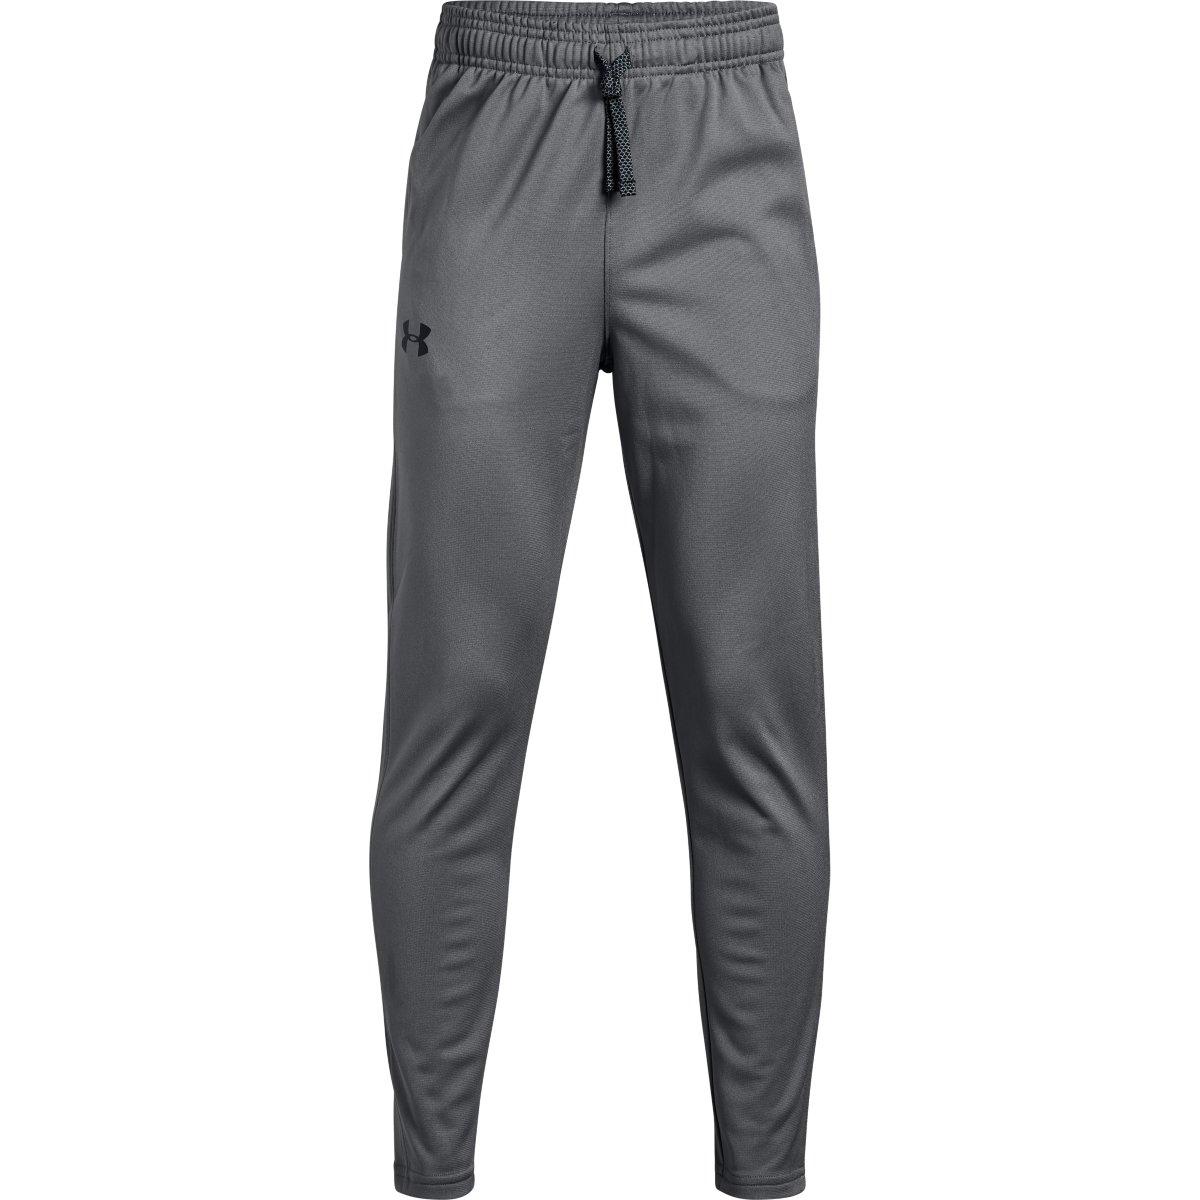 Under Armour Big Boys' Ua Brawler 2.0 Tapered Pants